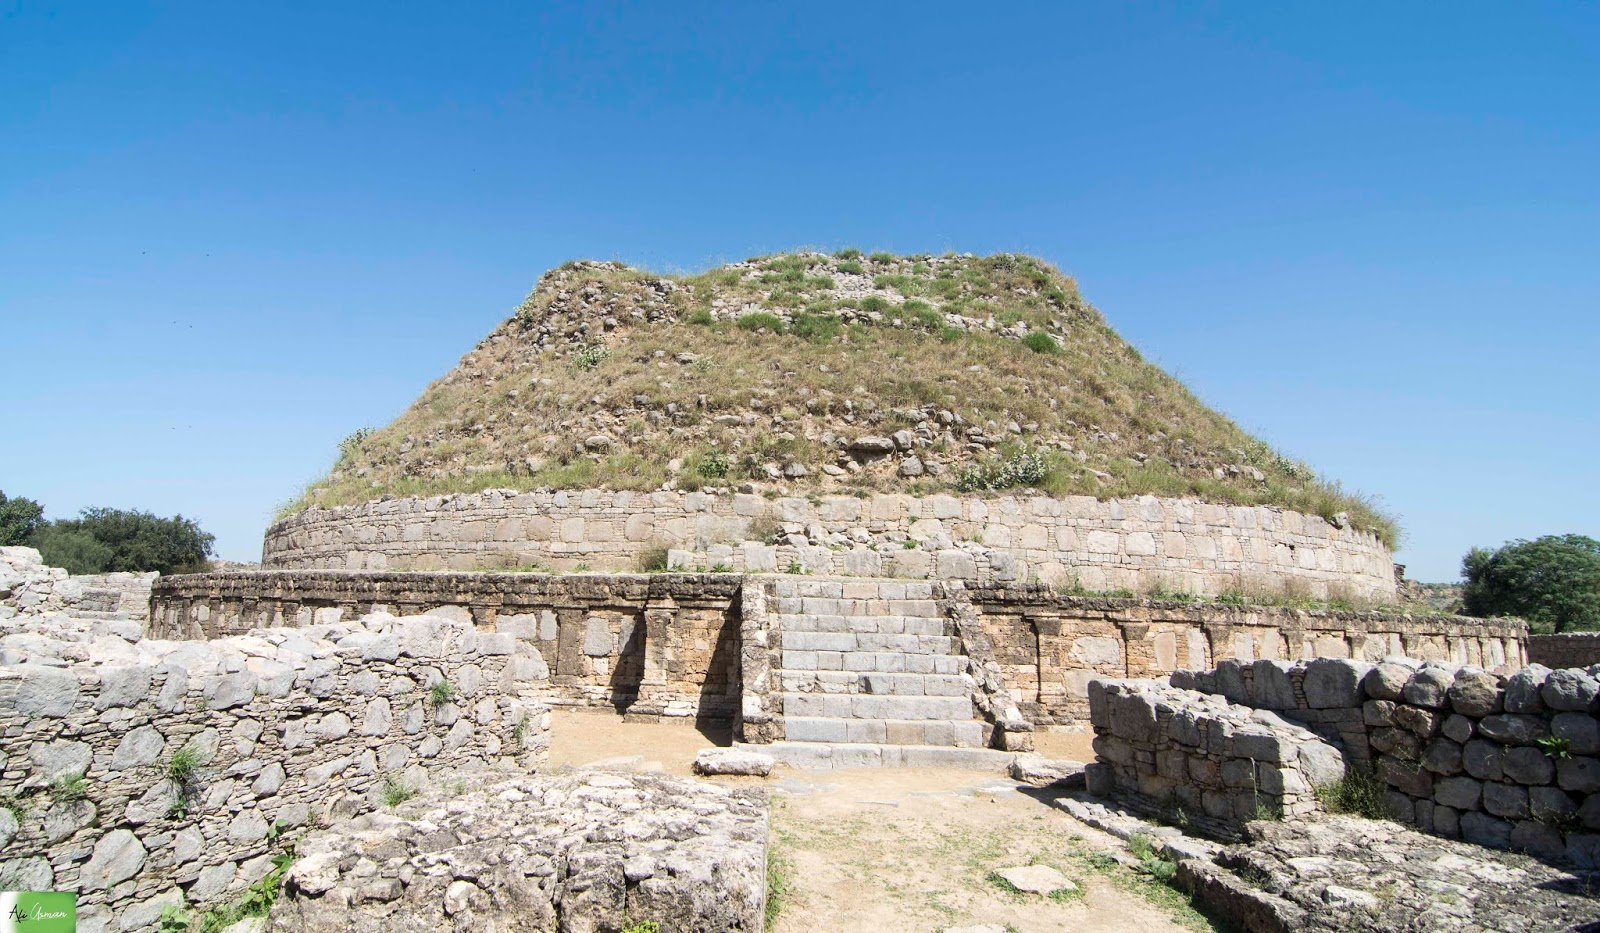 Ali Usman Baig : Dharmarajika Stupa Taxila